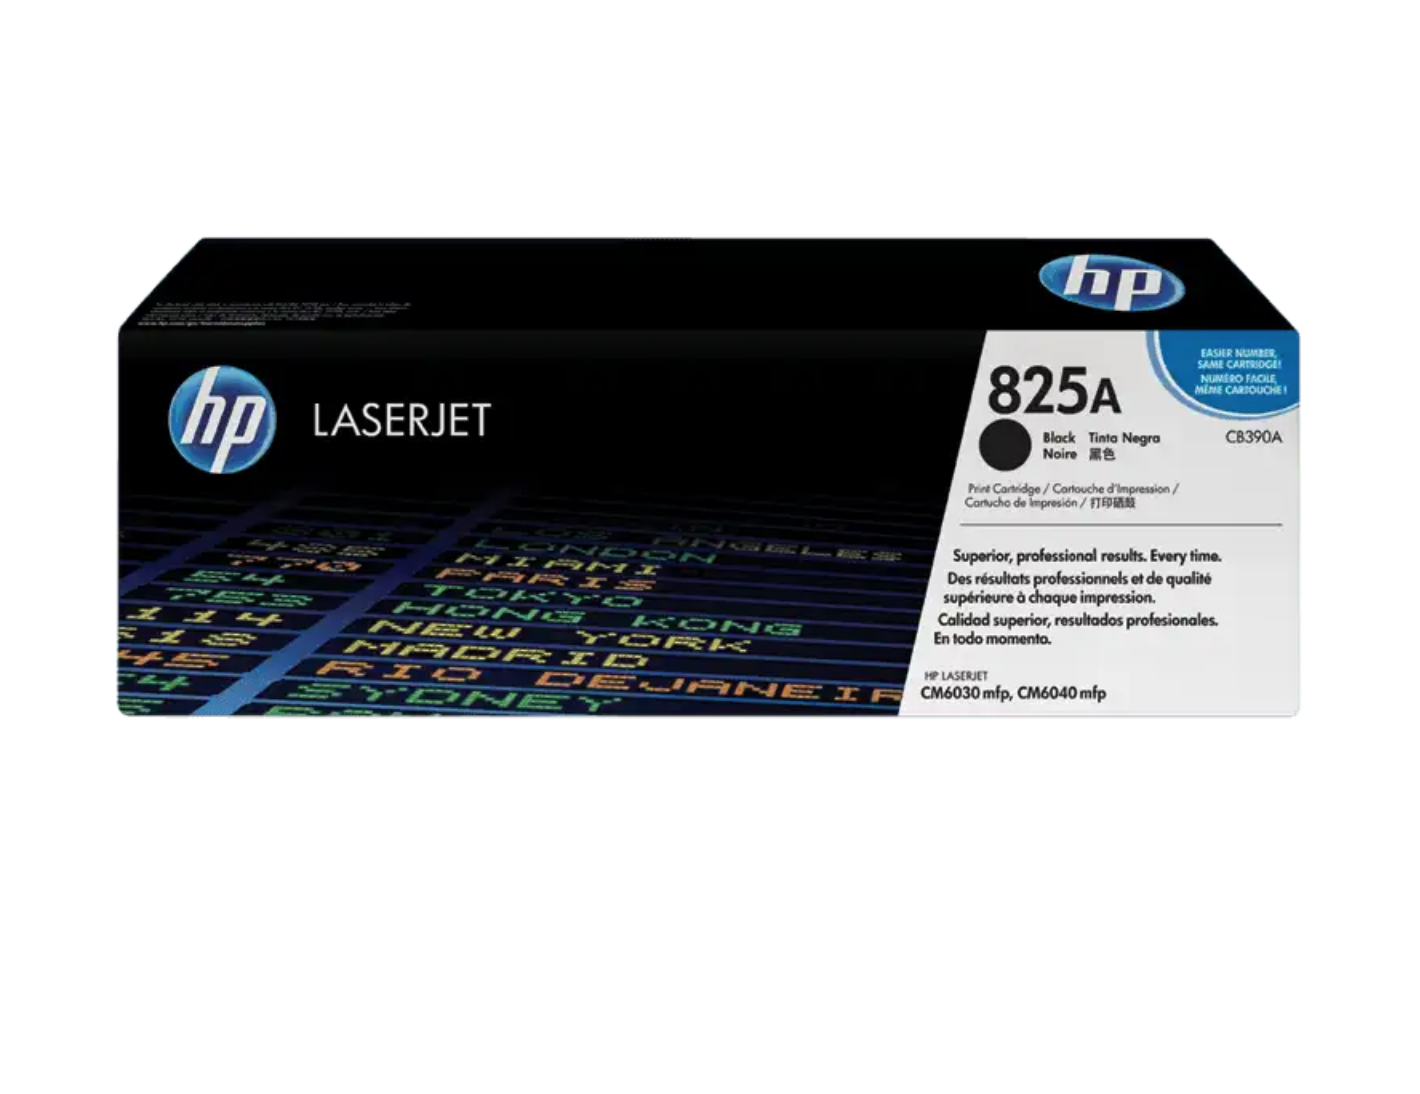 HP 825A 黑色原廠 LaserJet 碳粉 CB390A